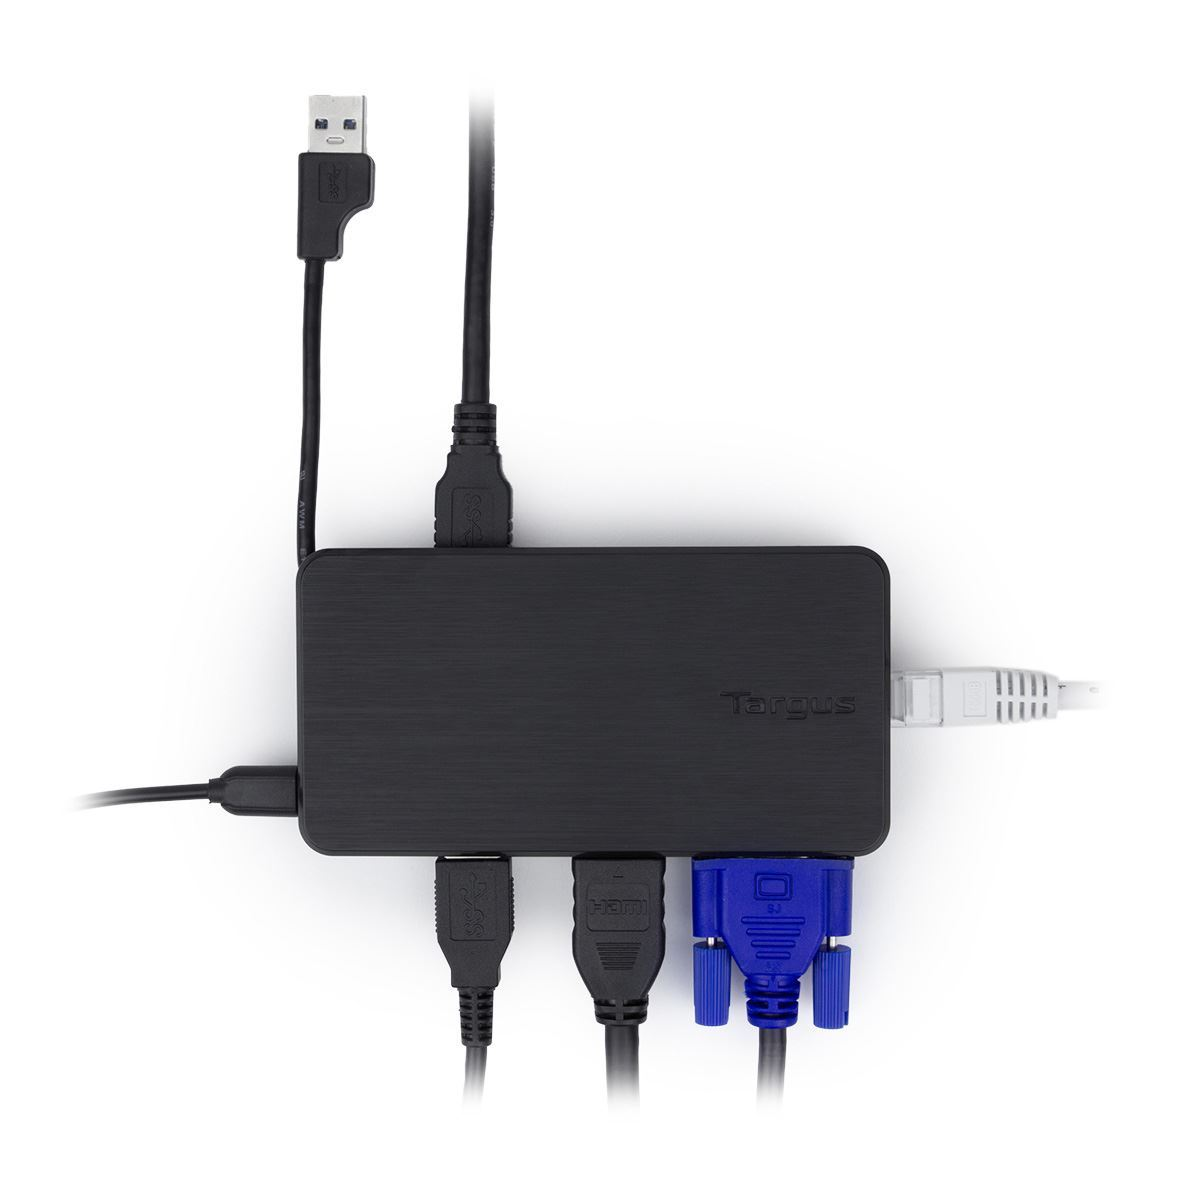 Targus Usb Multi Display Adapter Black Previously Dock110 Dock110euz